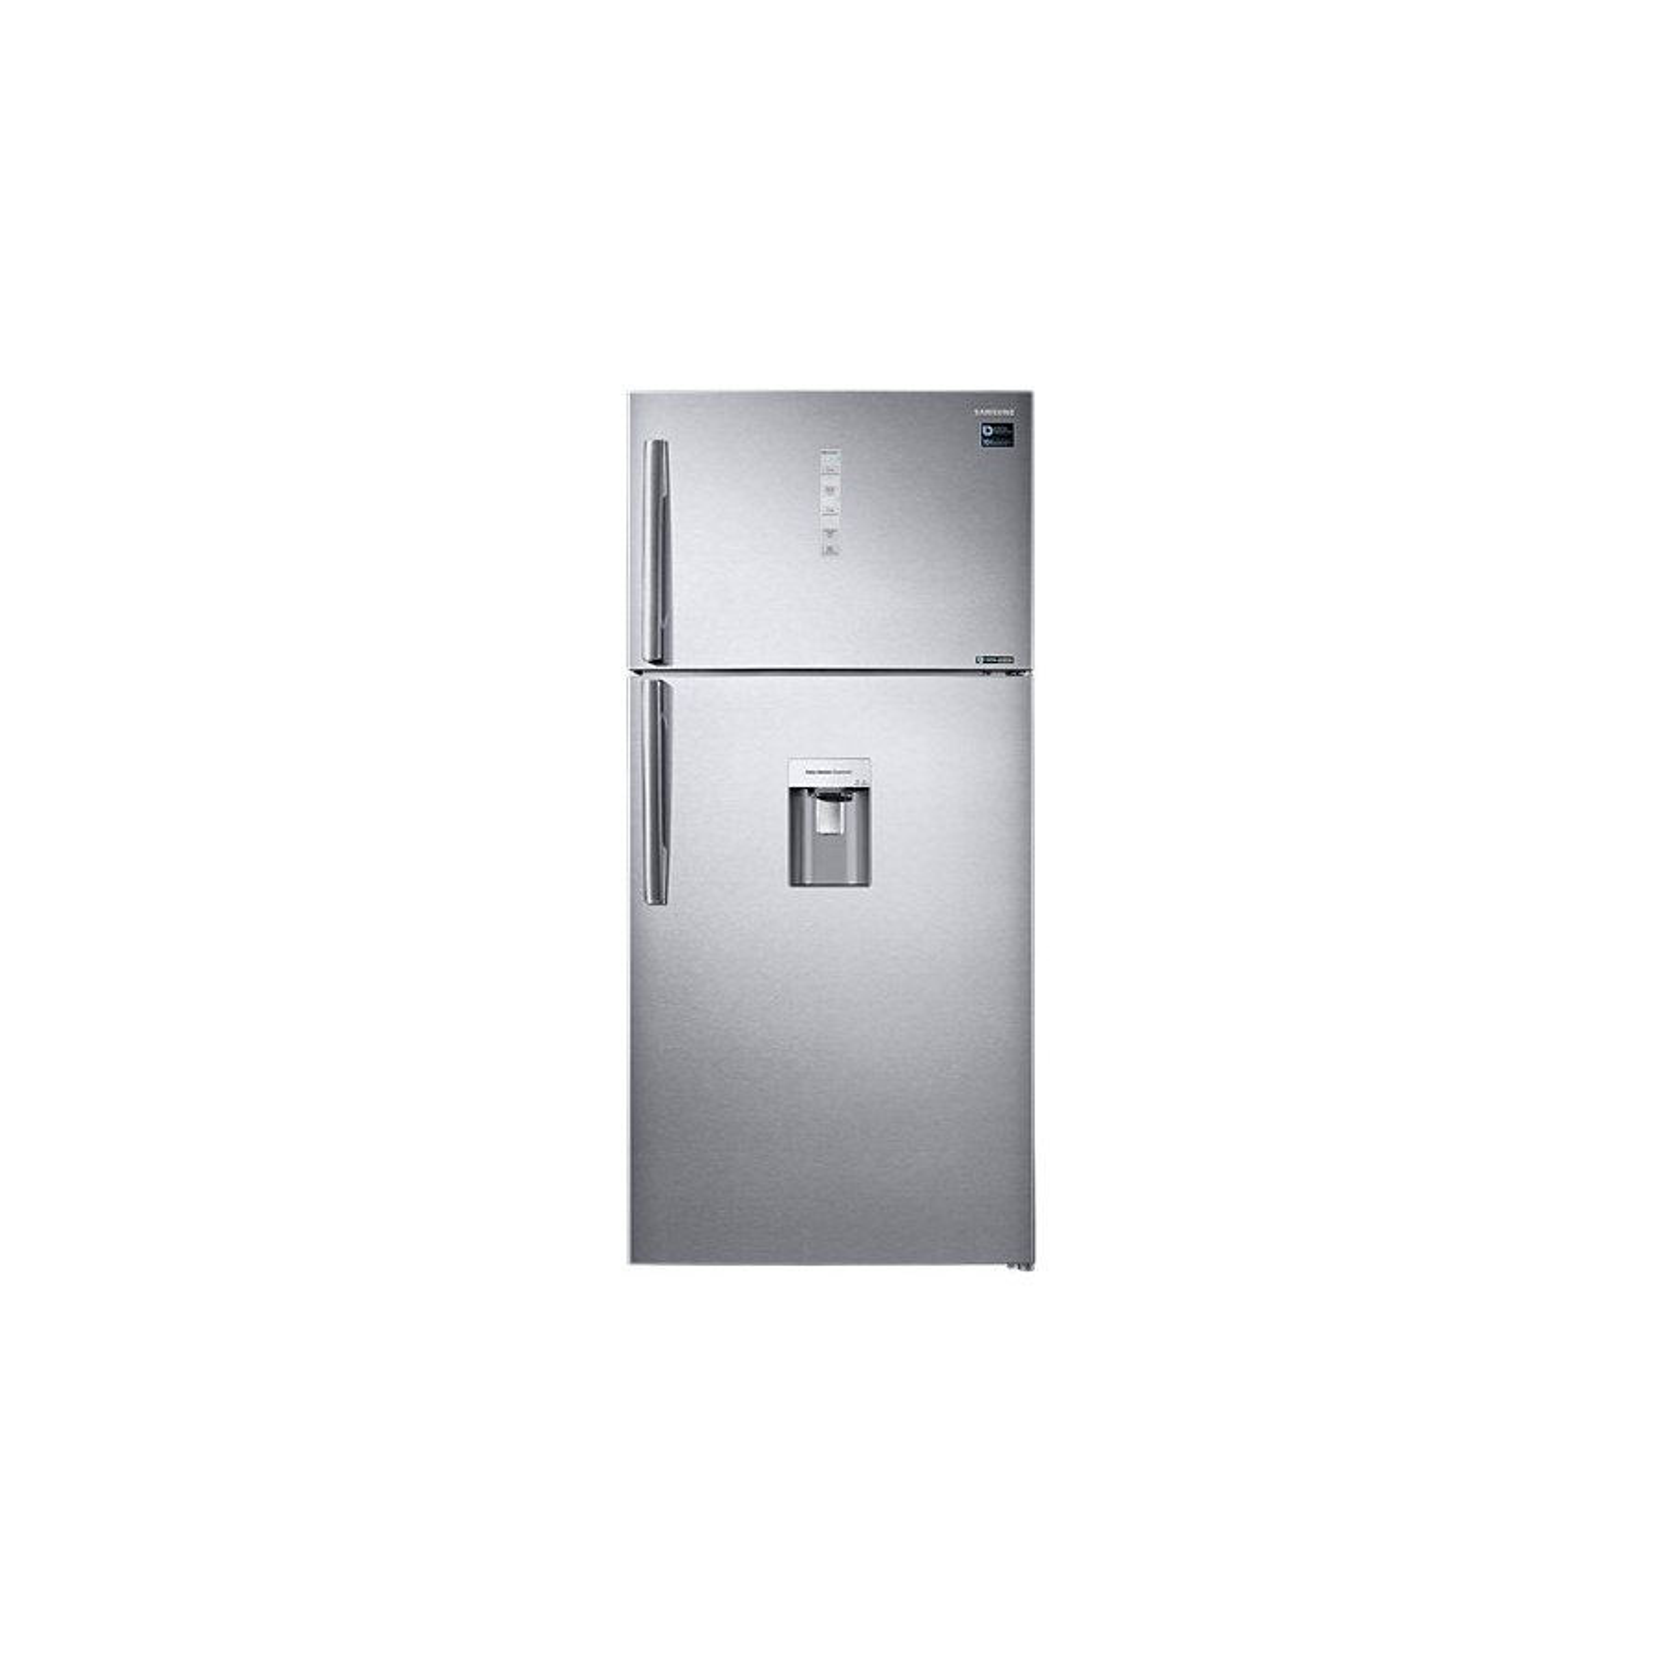 Frigorifero doppia porta samsung rt62k7515sl a inox con - Frigoriferi smeg doppia porta ...